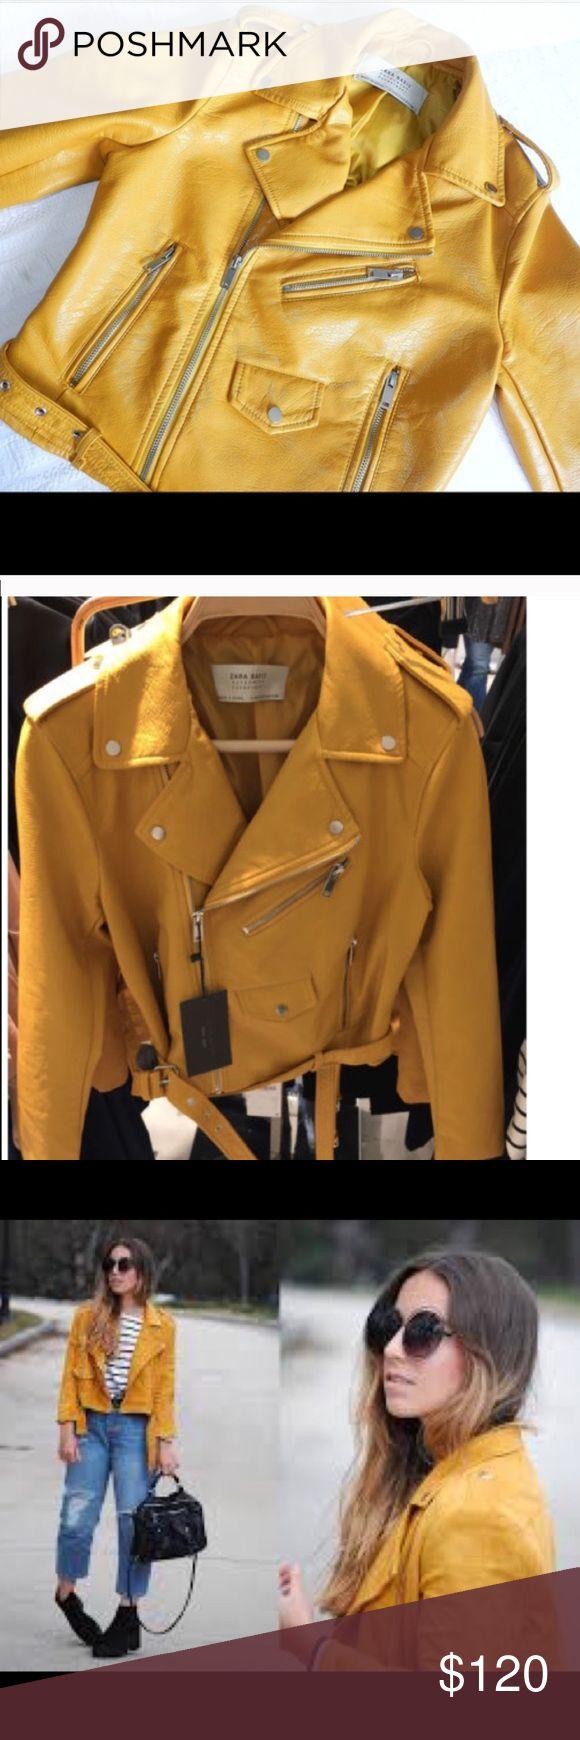 Leather jacket yellow zara - Zara Leather Jacket Yellow Mustard Nwt Zara Leather Jacket Nwt Zara Jackets Coats